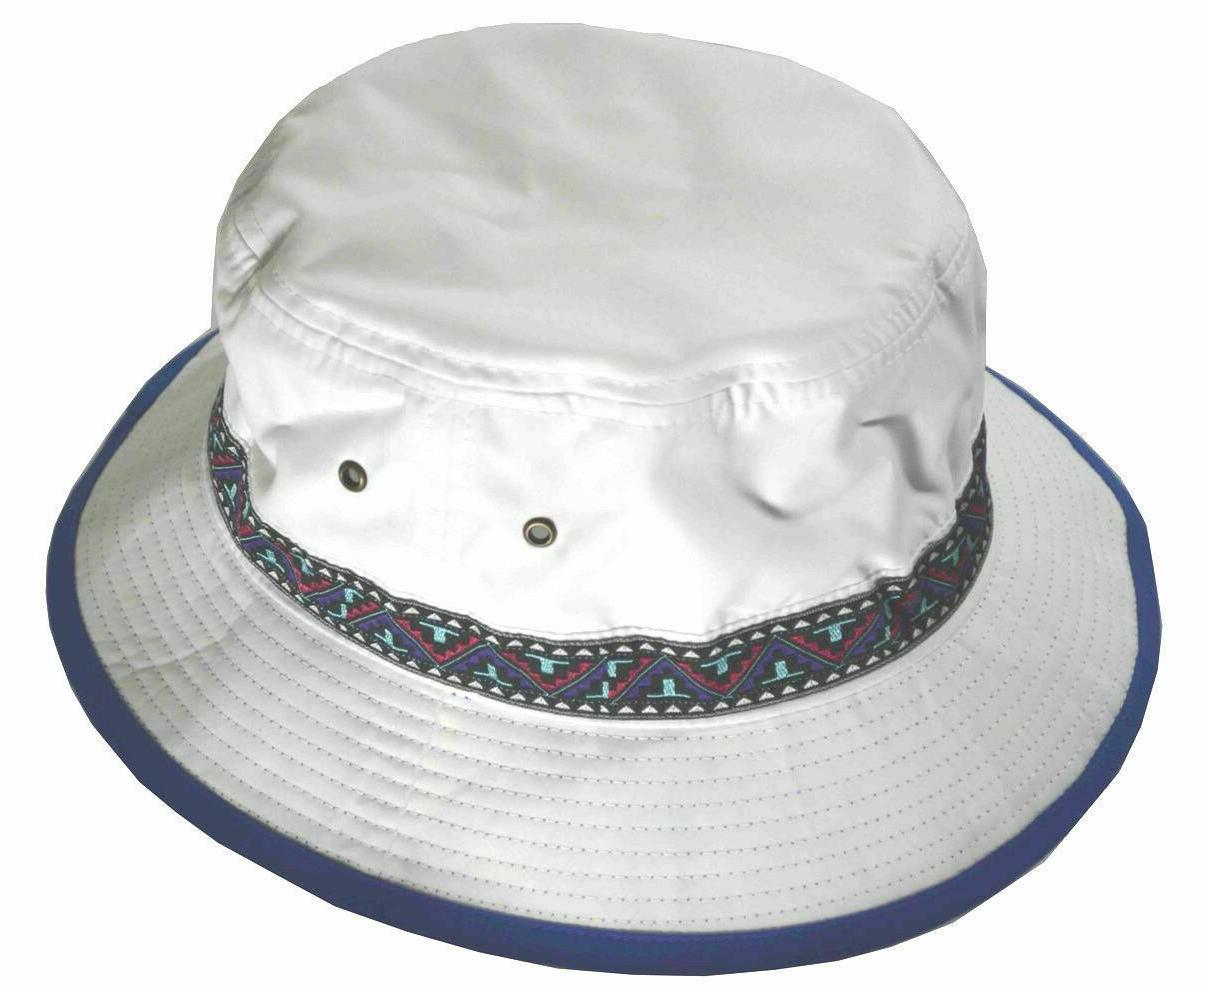 brushed microfiber bucket hat with jacquard decorative